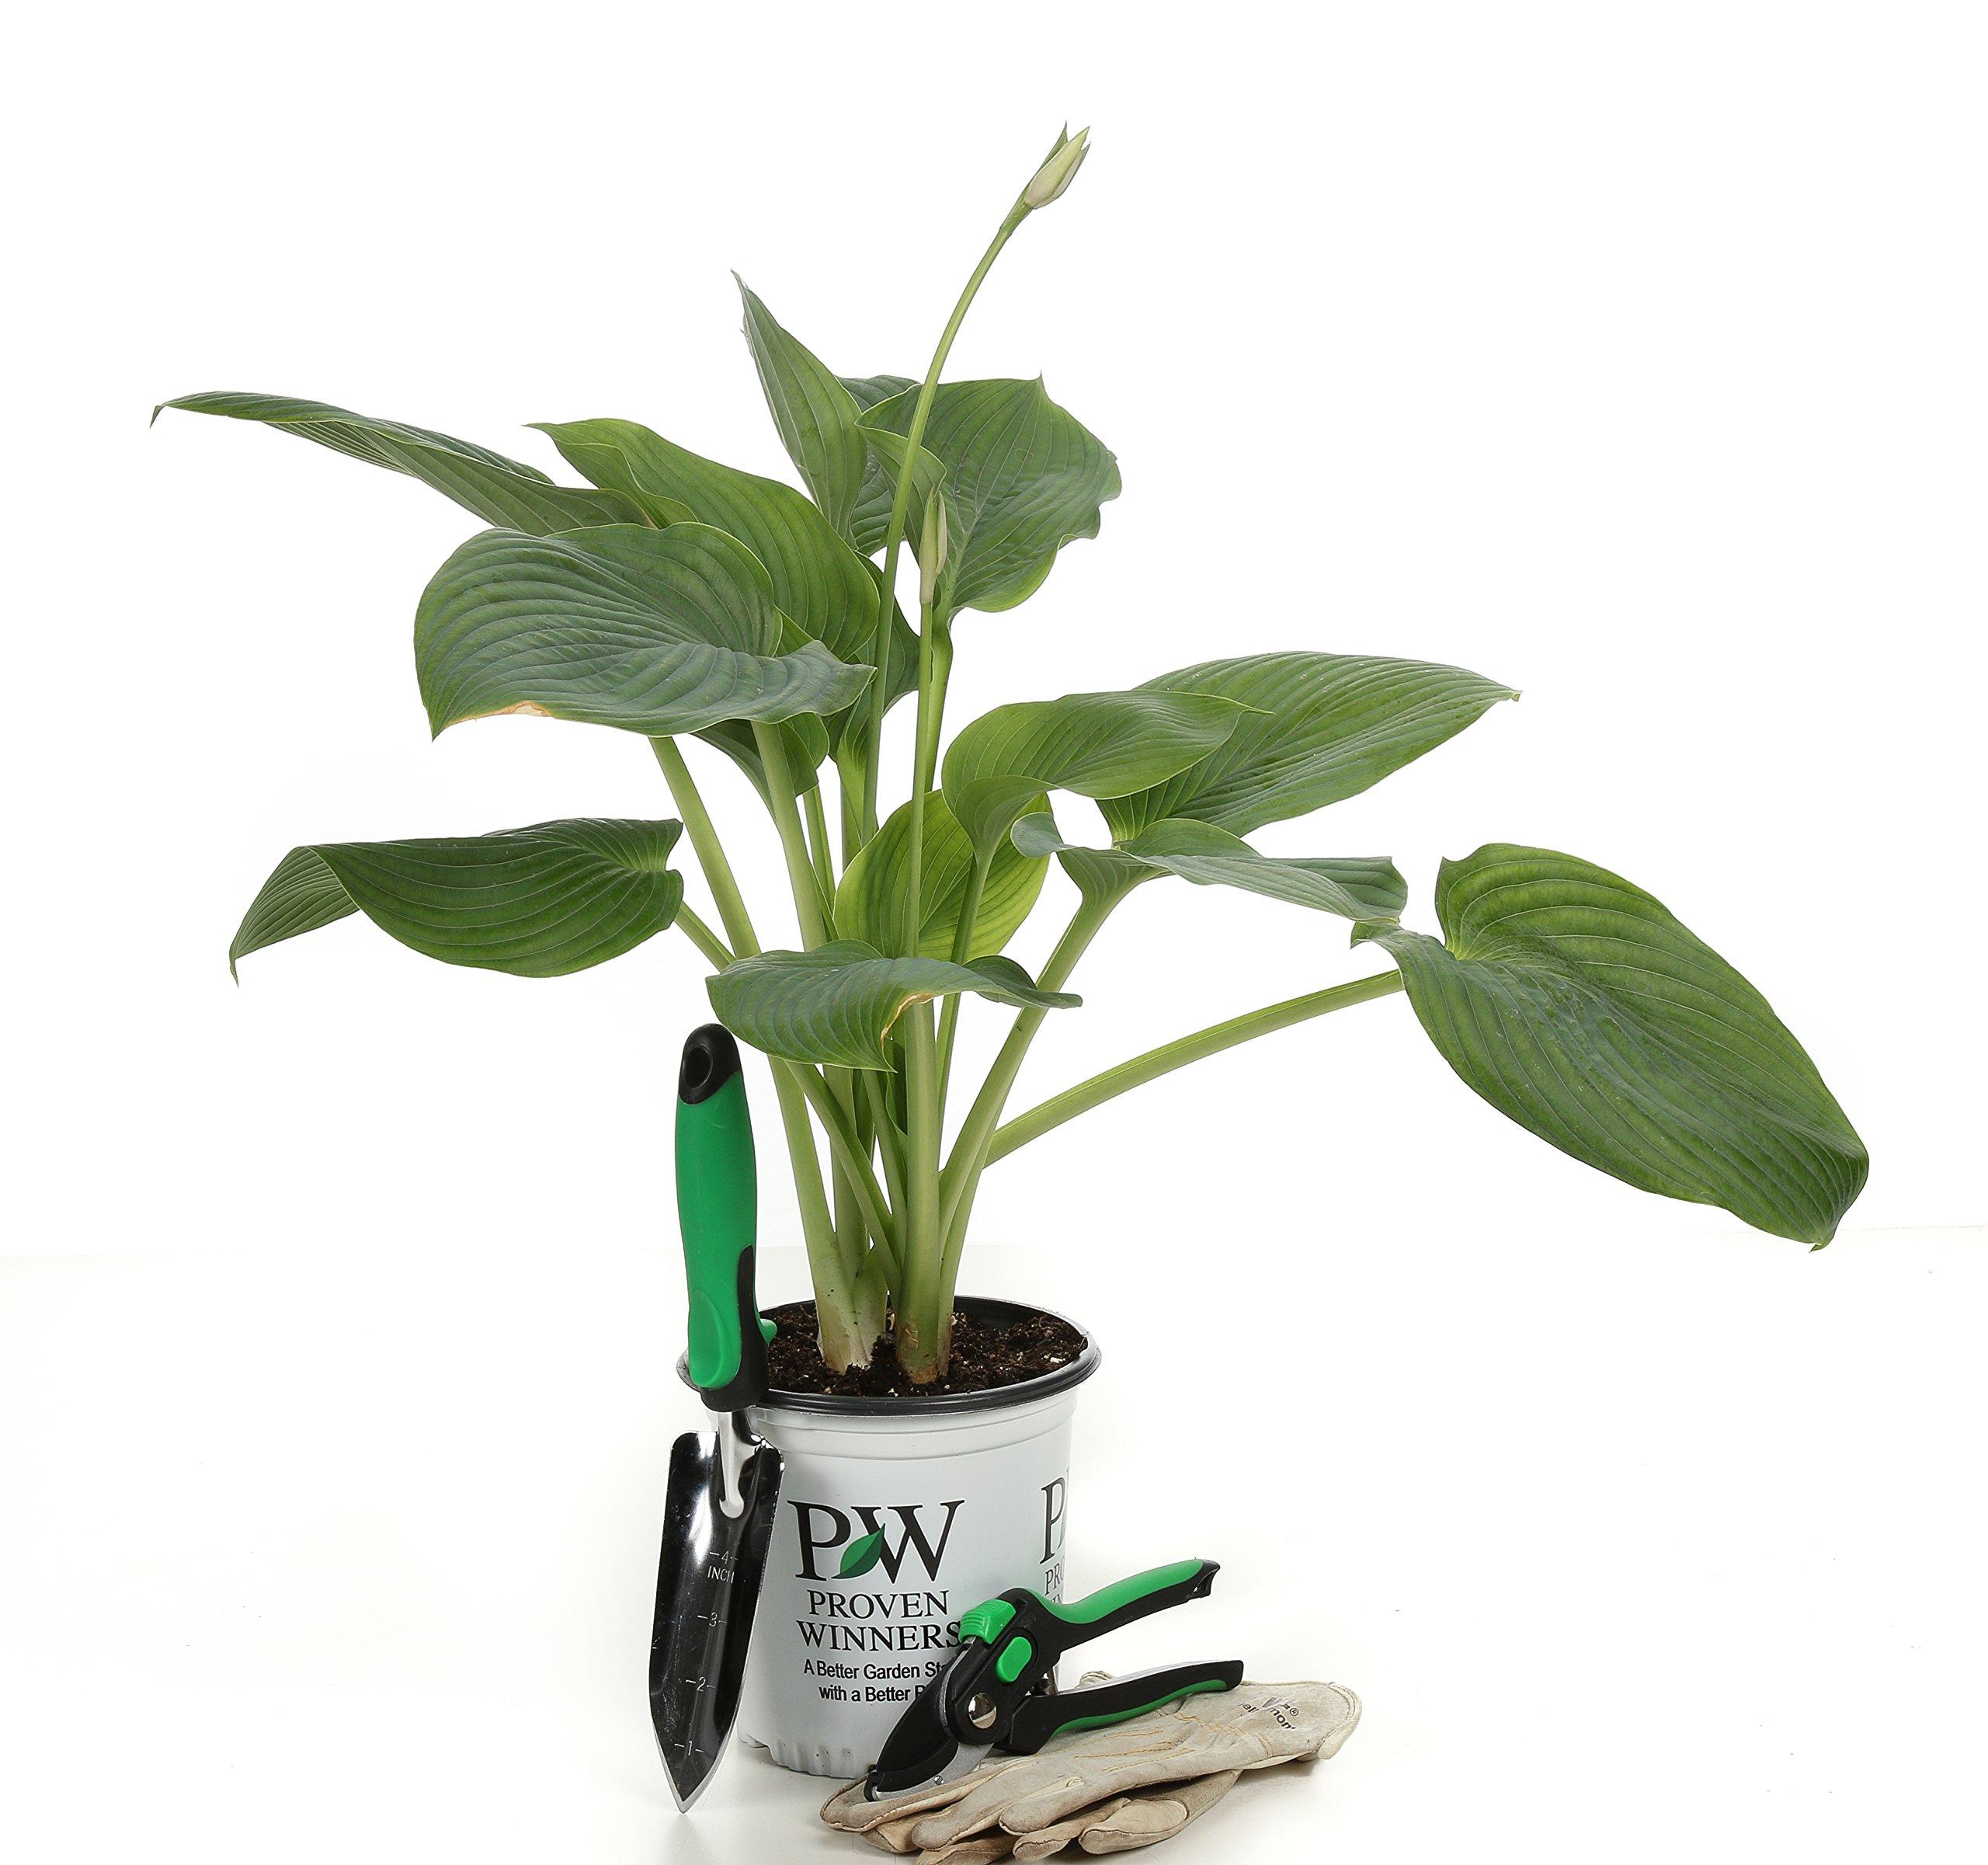 Shadowland Empress Wu (Hosta) Live Plant, Green Foliage, 0.65 Gallon by Proven Winners (Image #8)